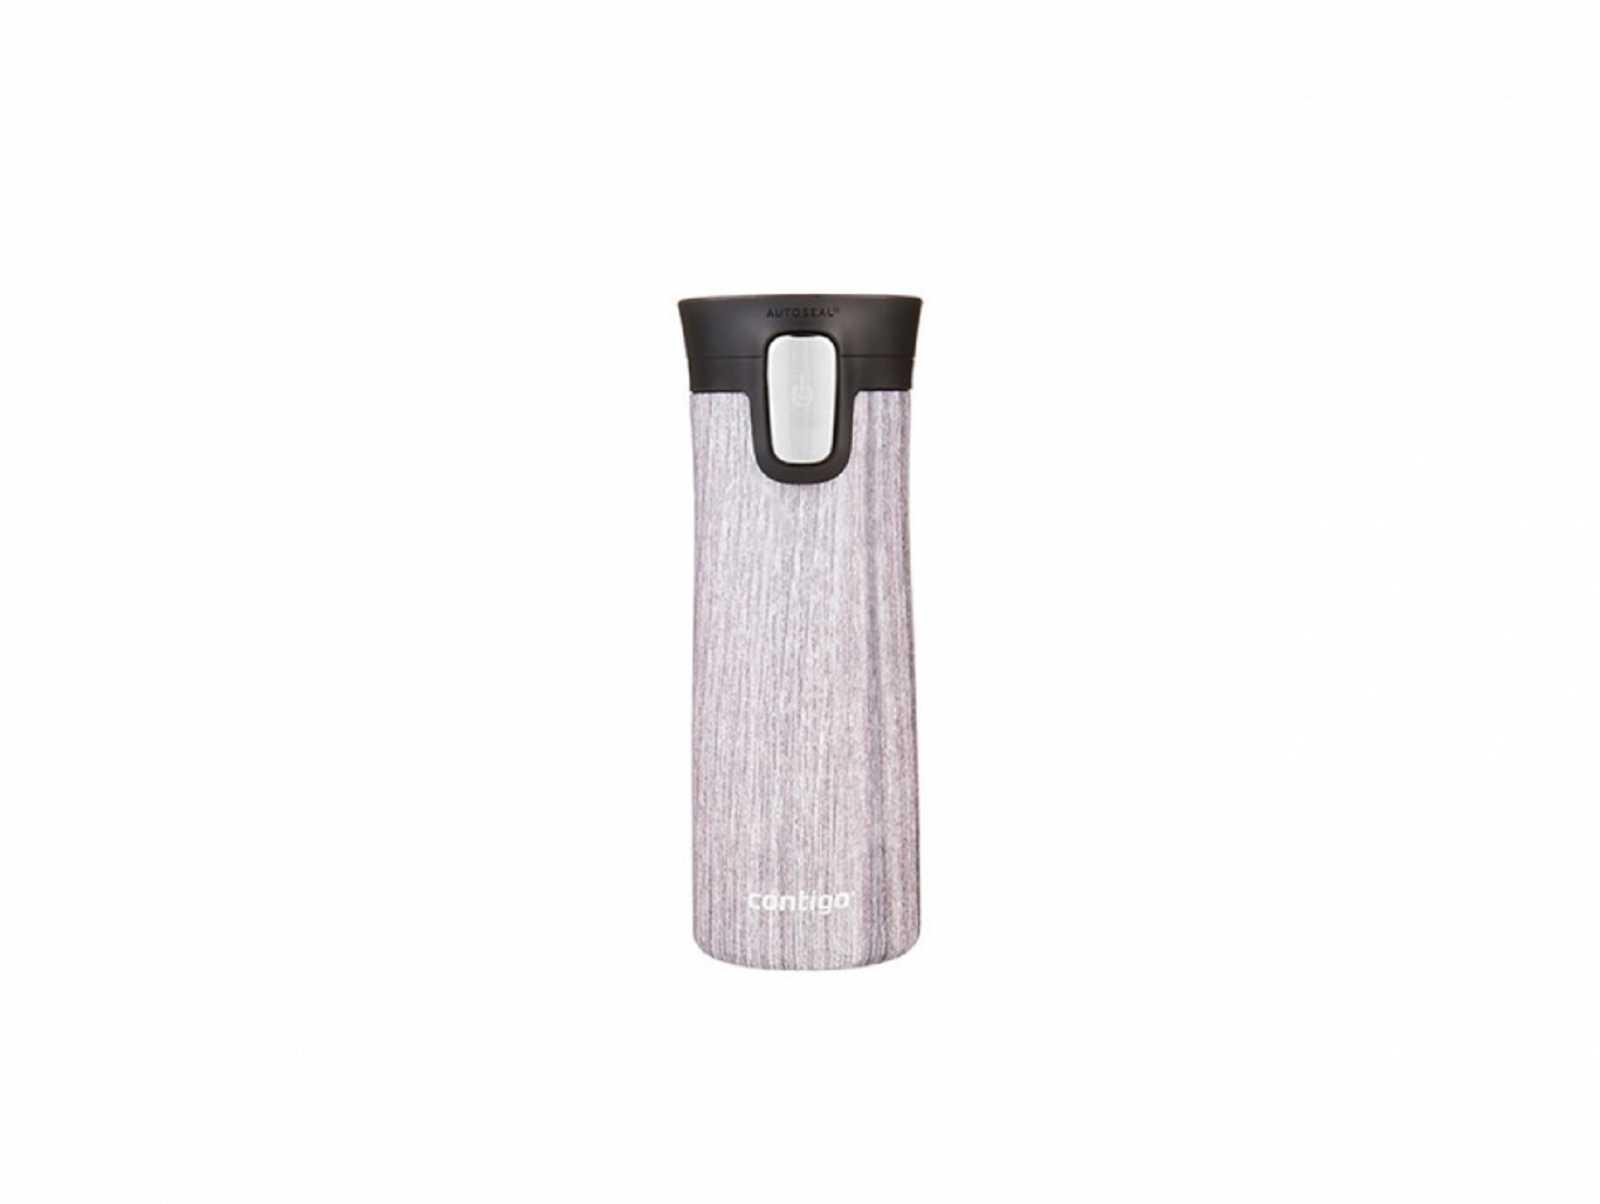 Онлайн каталог PROMENU: Термостакан Contigo PINNACLE COUTURE Blonde Wood, объем 0,42 л, светлый с рисунком                  Contigo 2104546